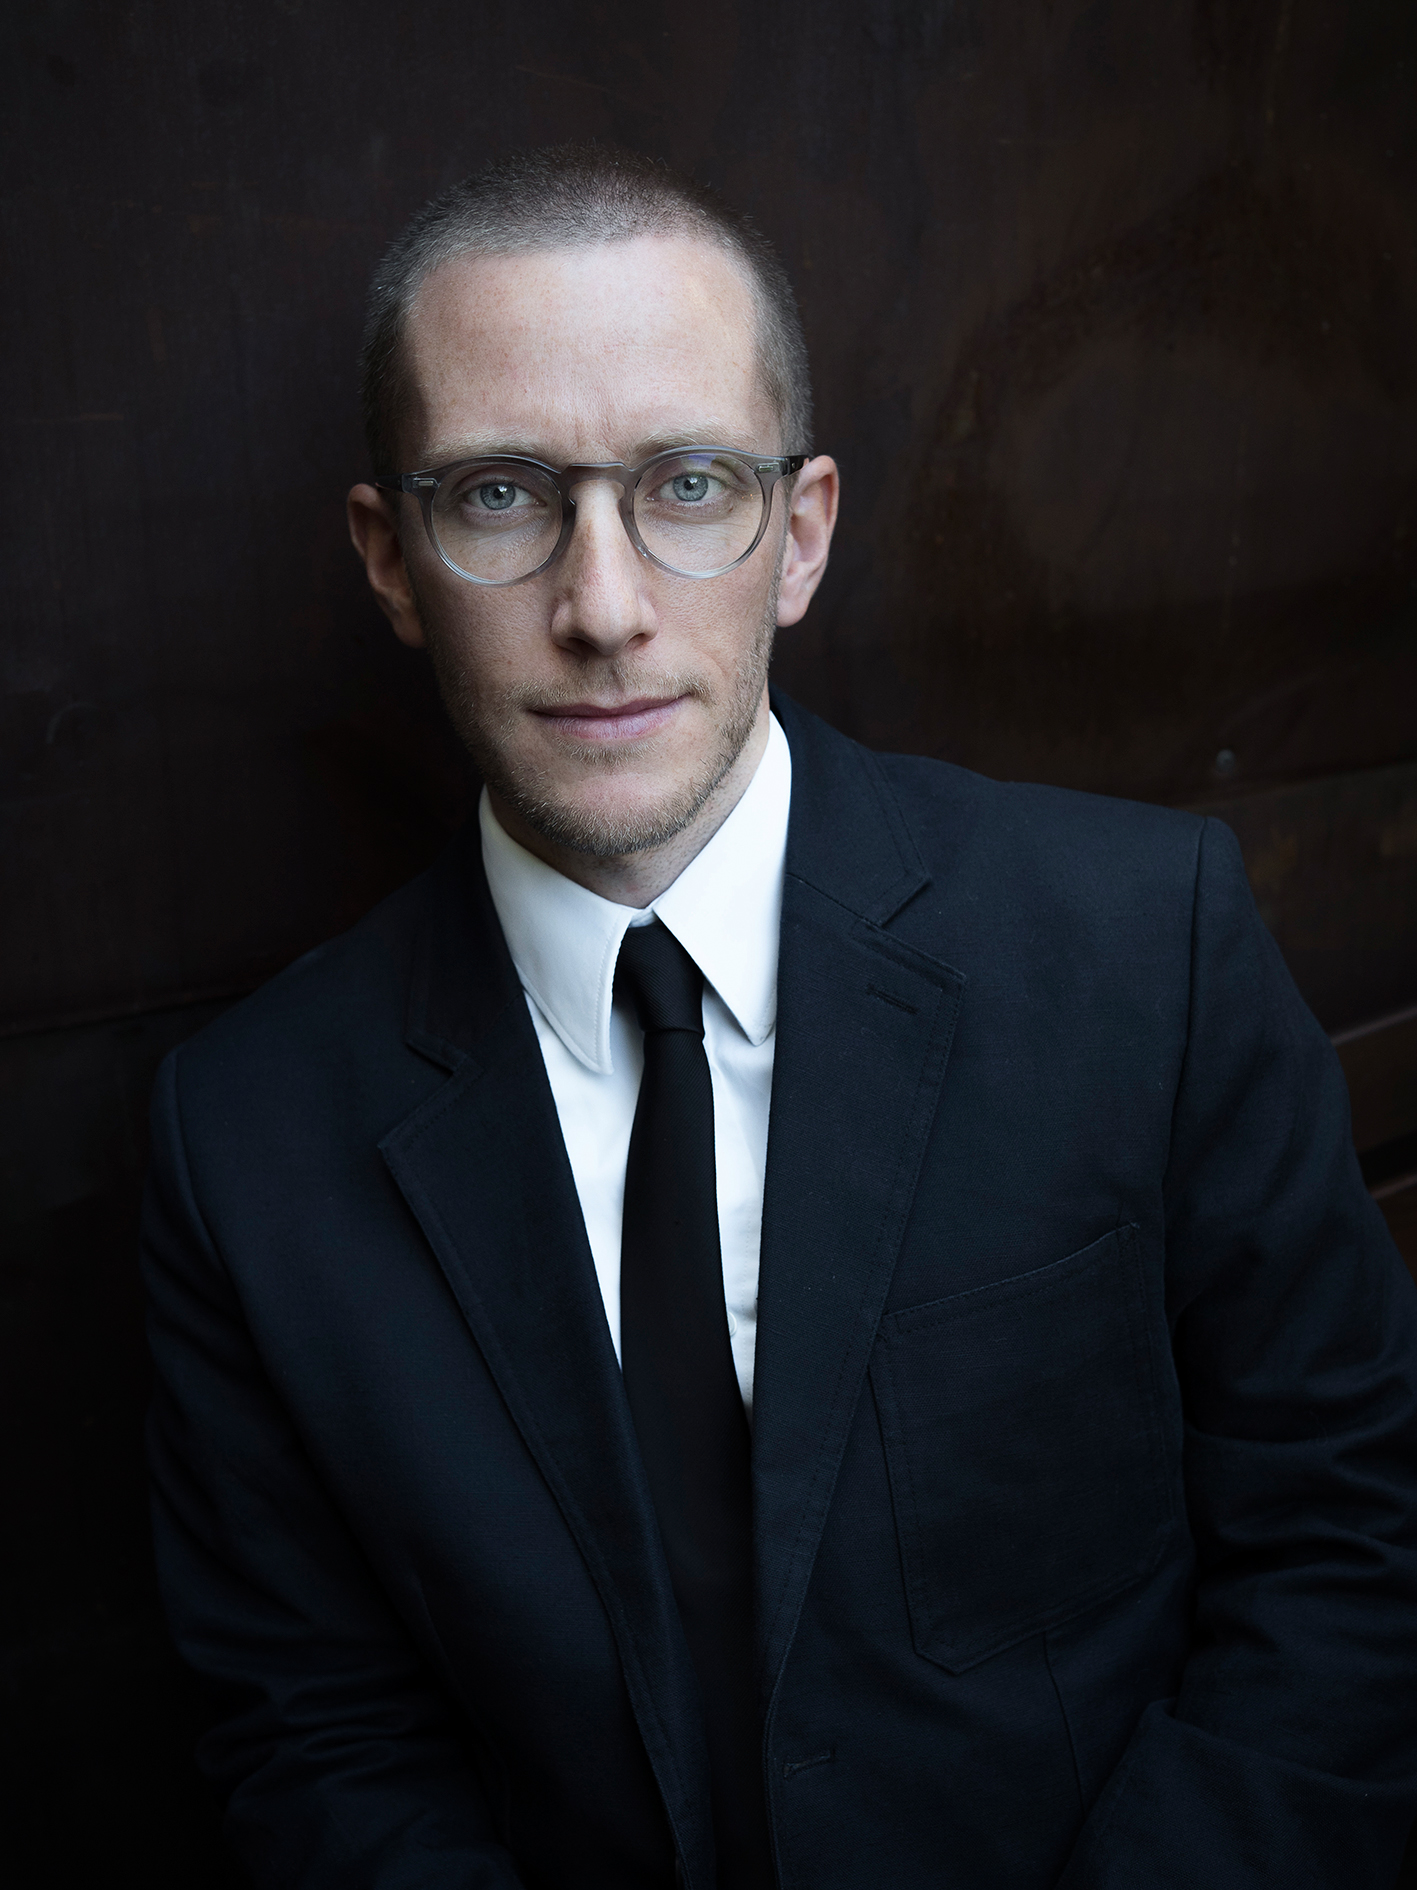 Novelist Lars Petter Sveen